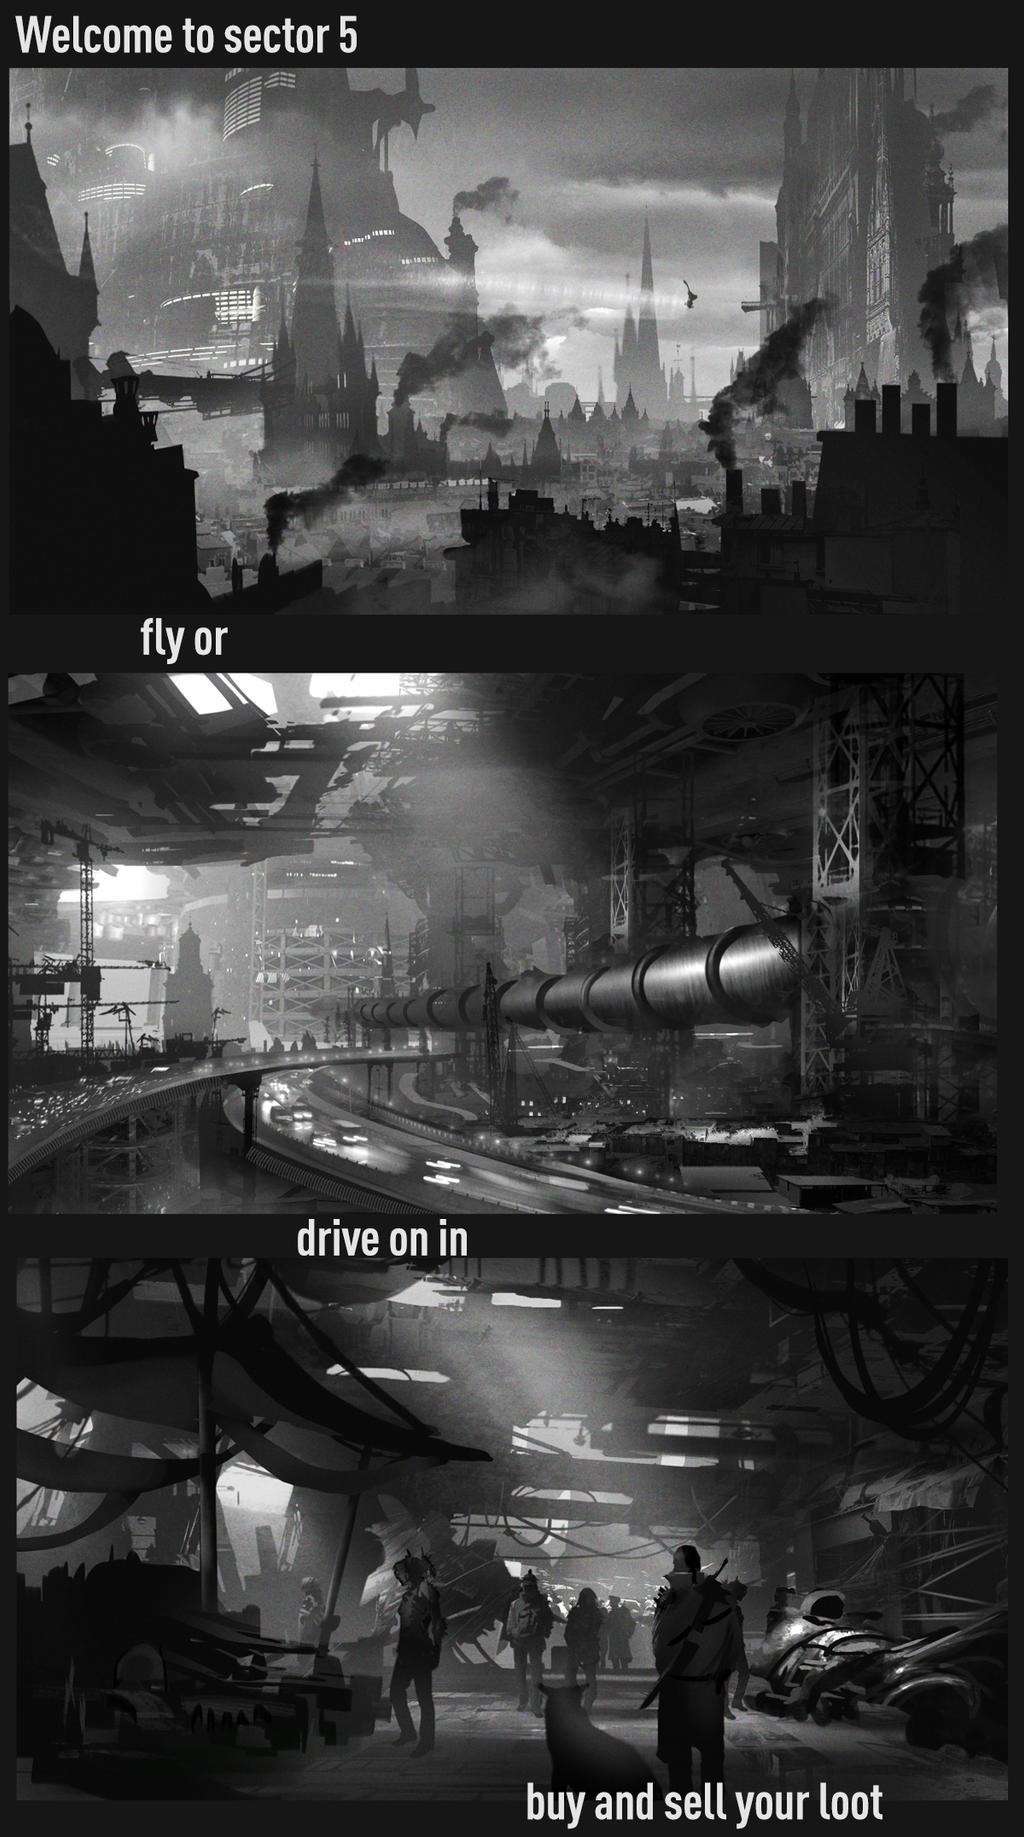 Sector 5 by TylerEdlinArt